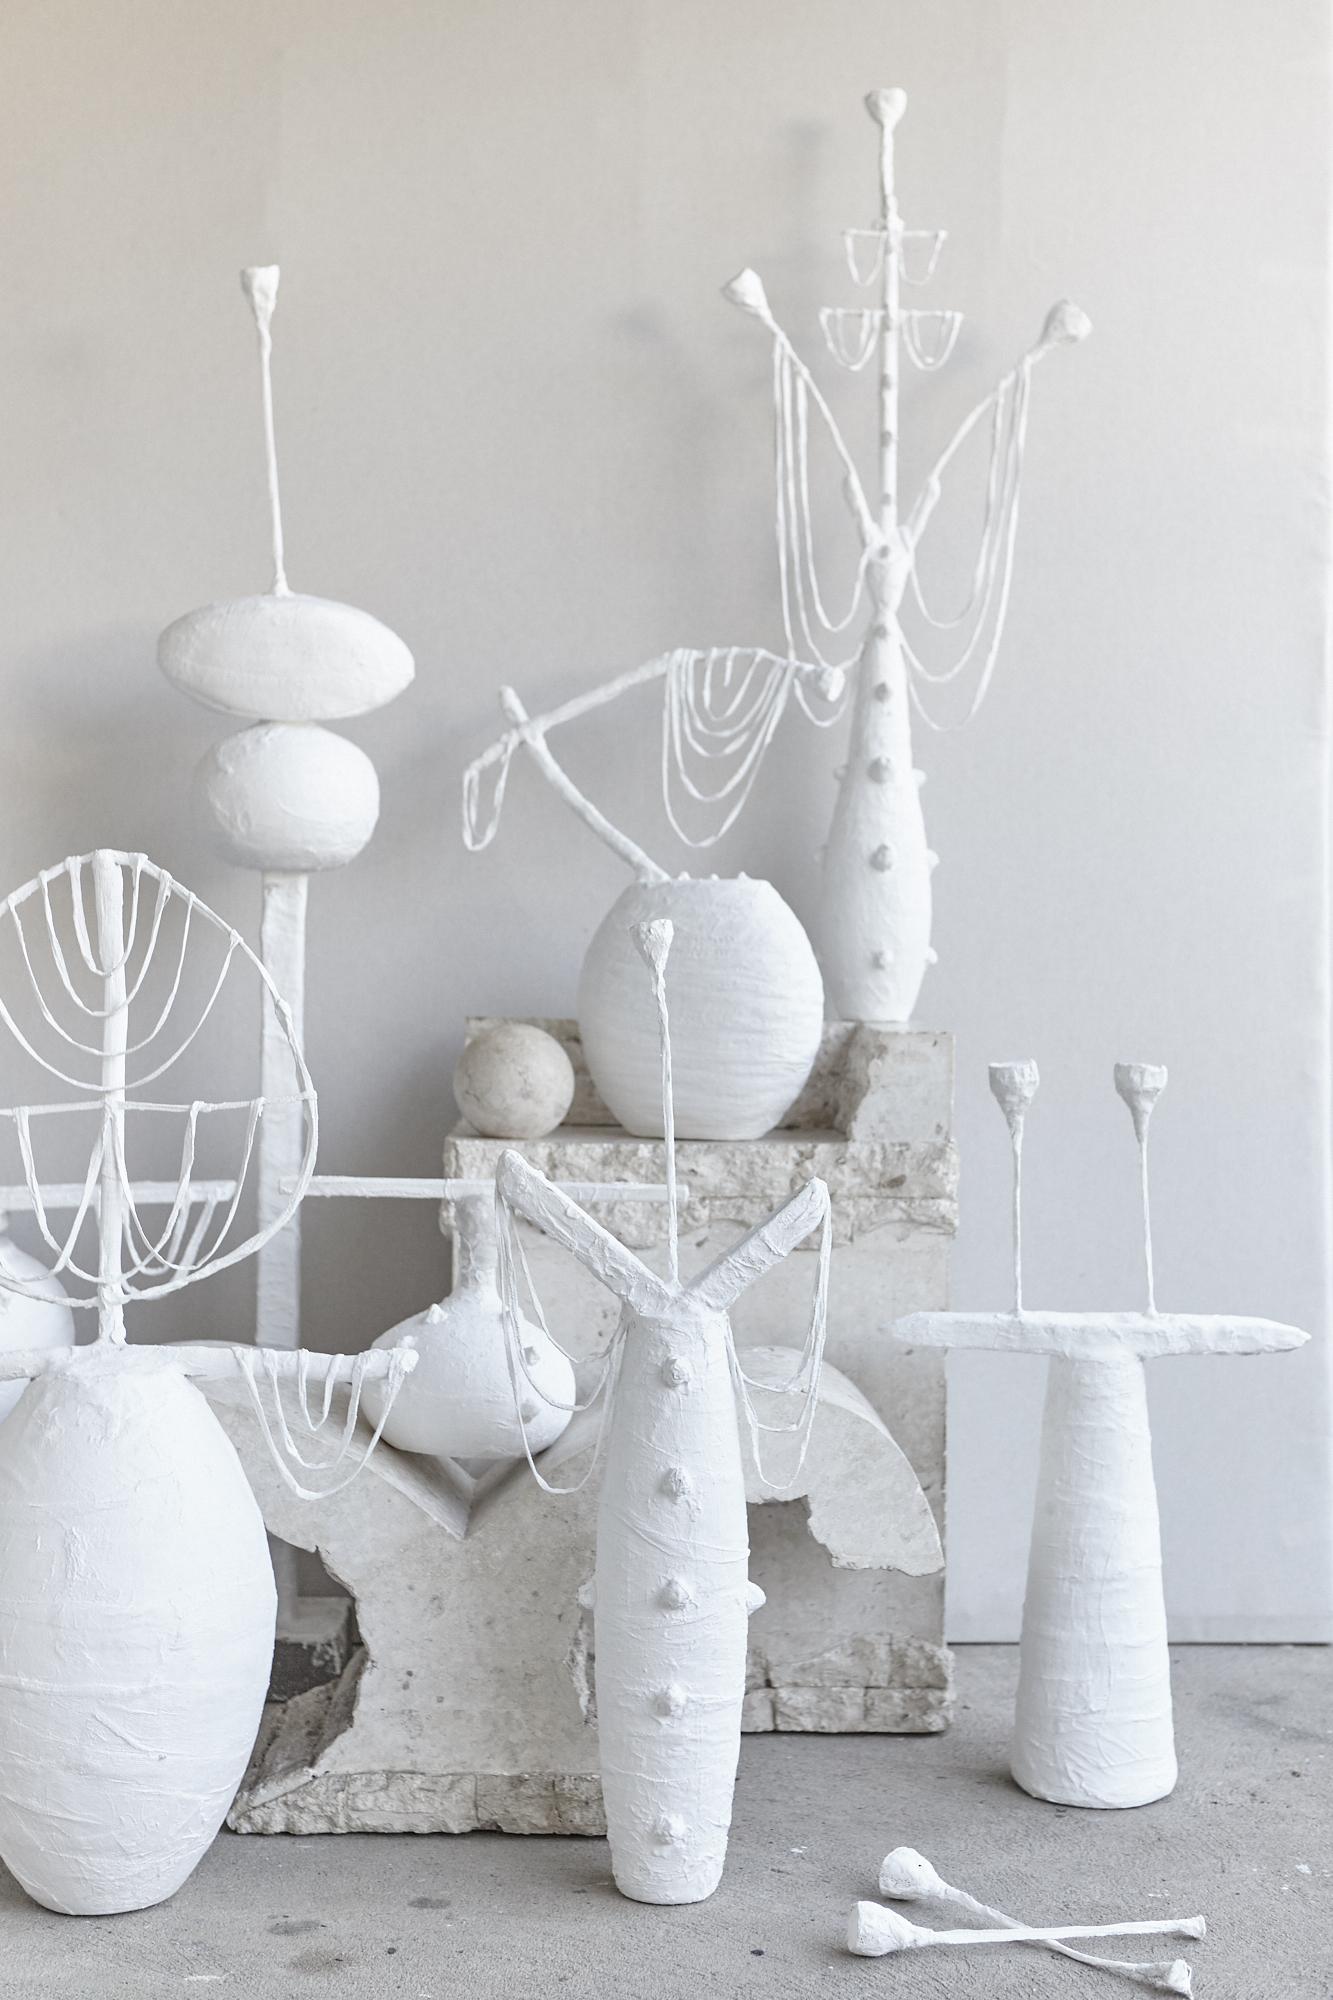 New sculptural works shot by Jared O'Sullivan